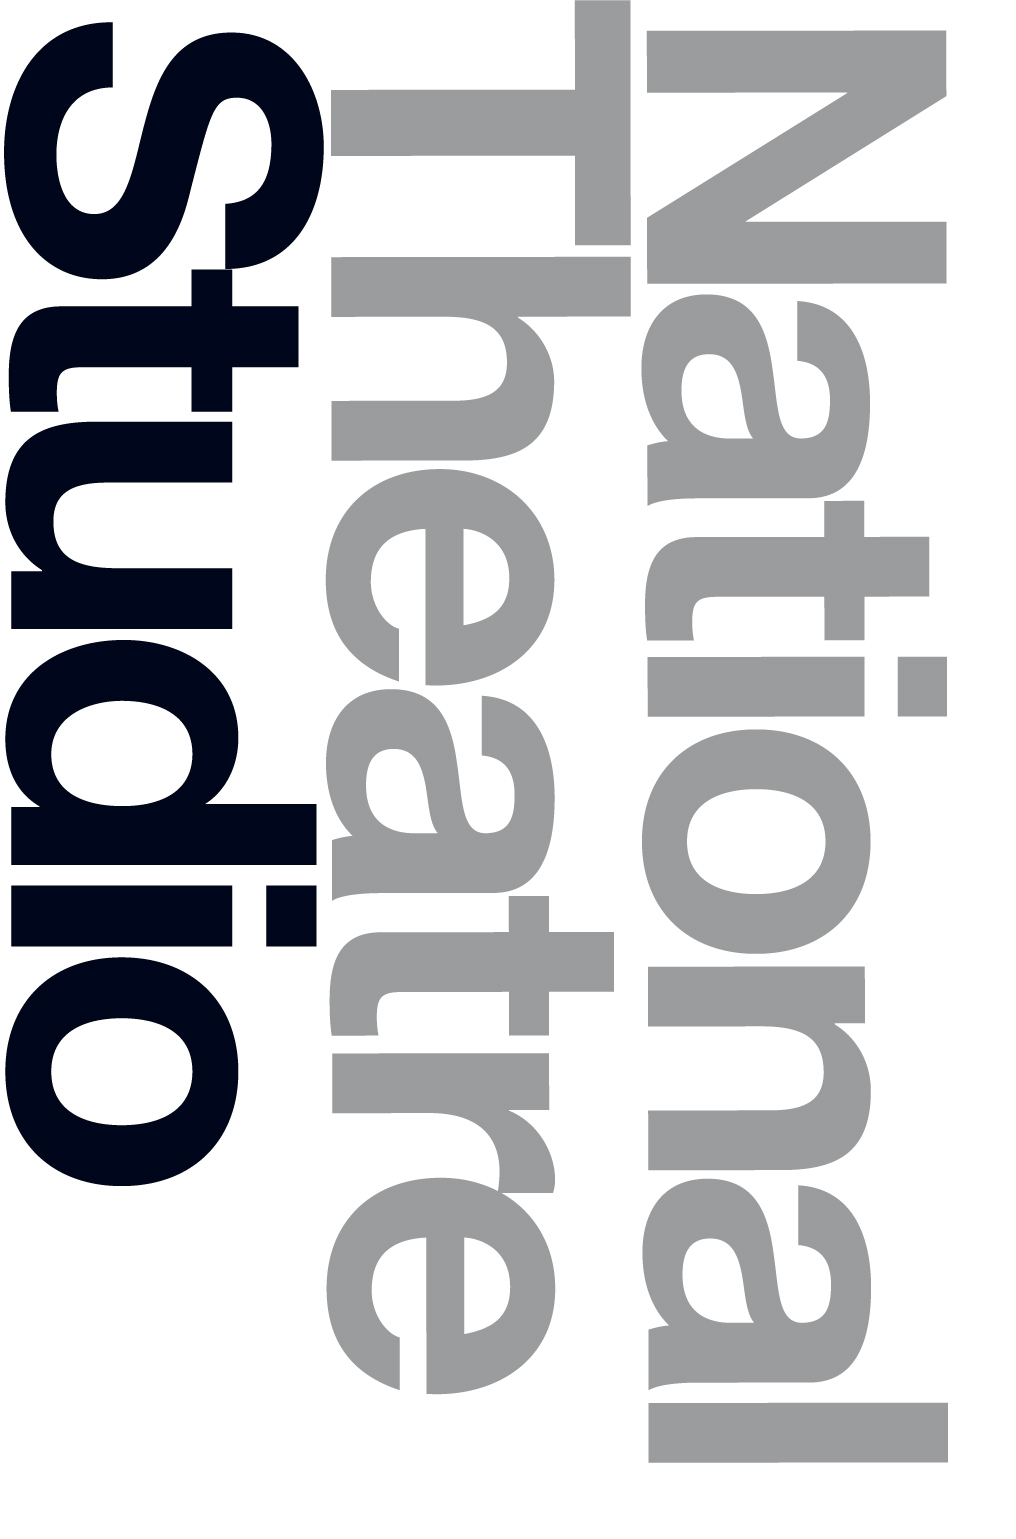 Studio-logo-vertical_May-2010.jpg